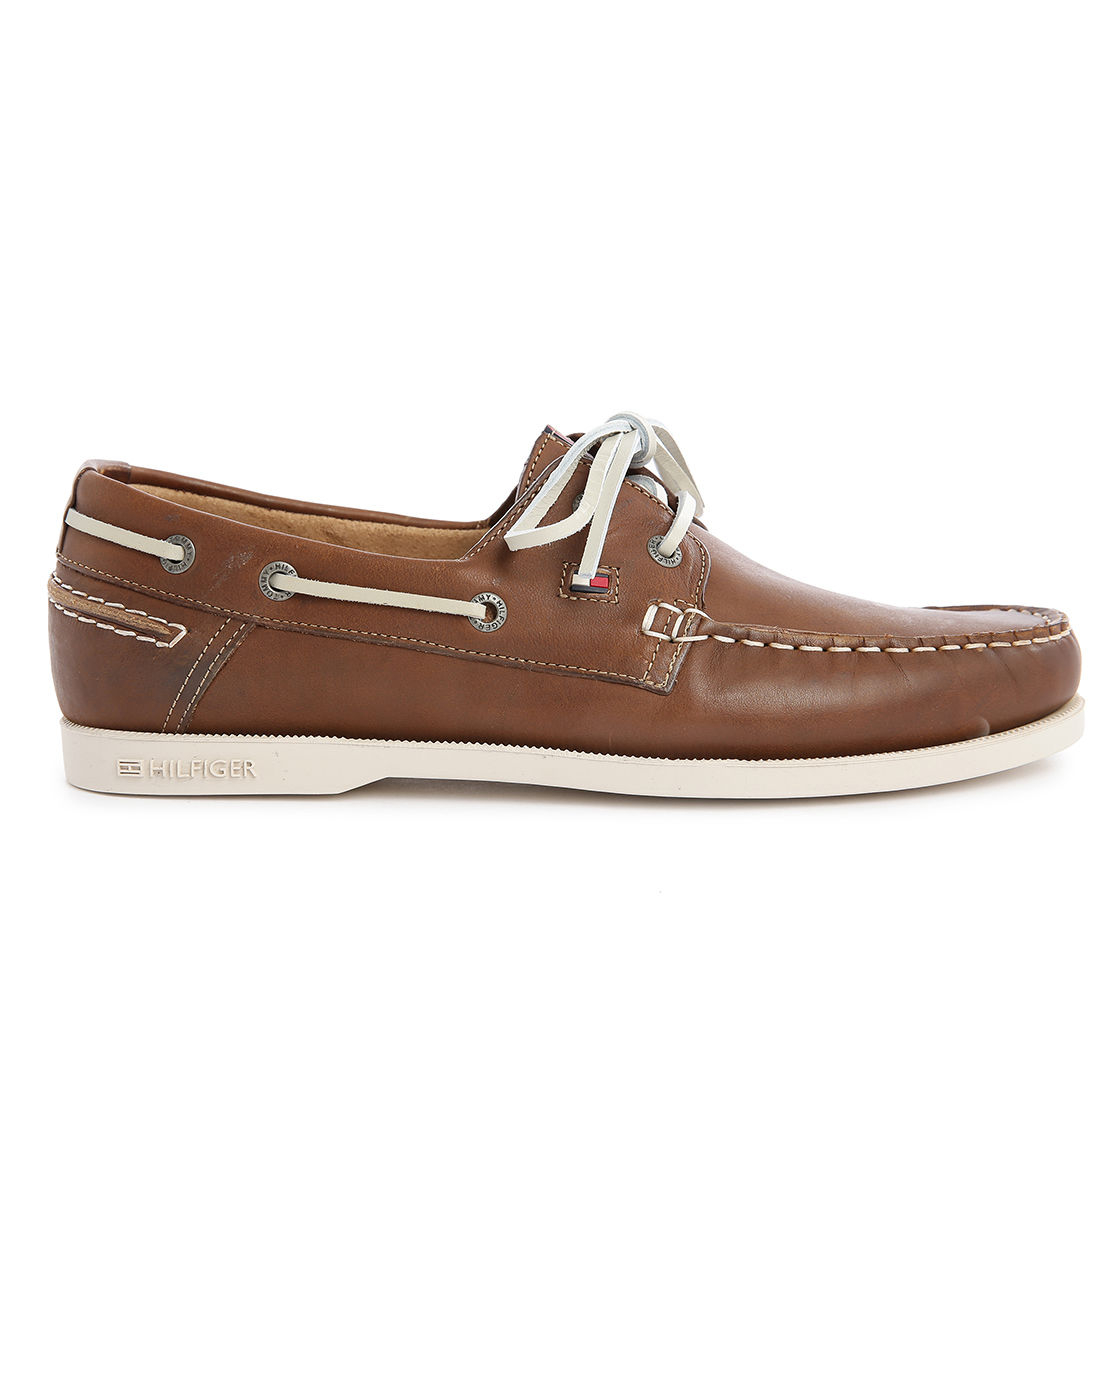 Mens Camel Boat Shoes